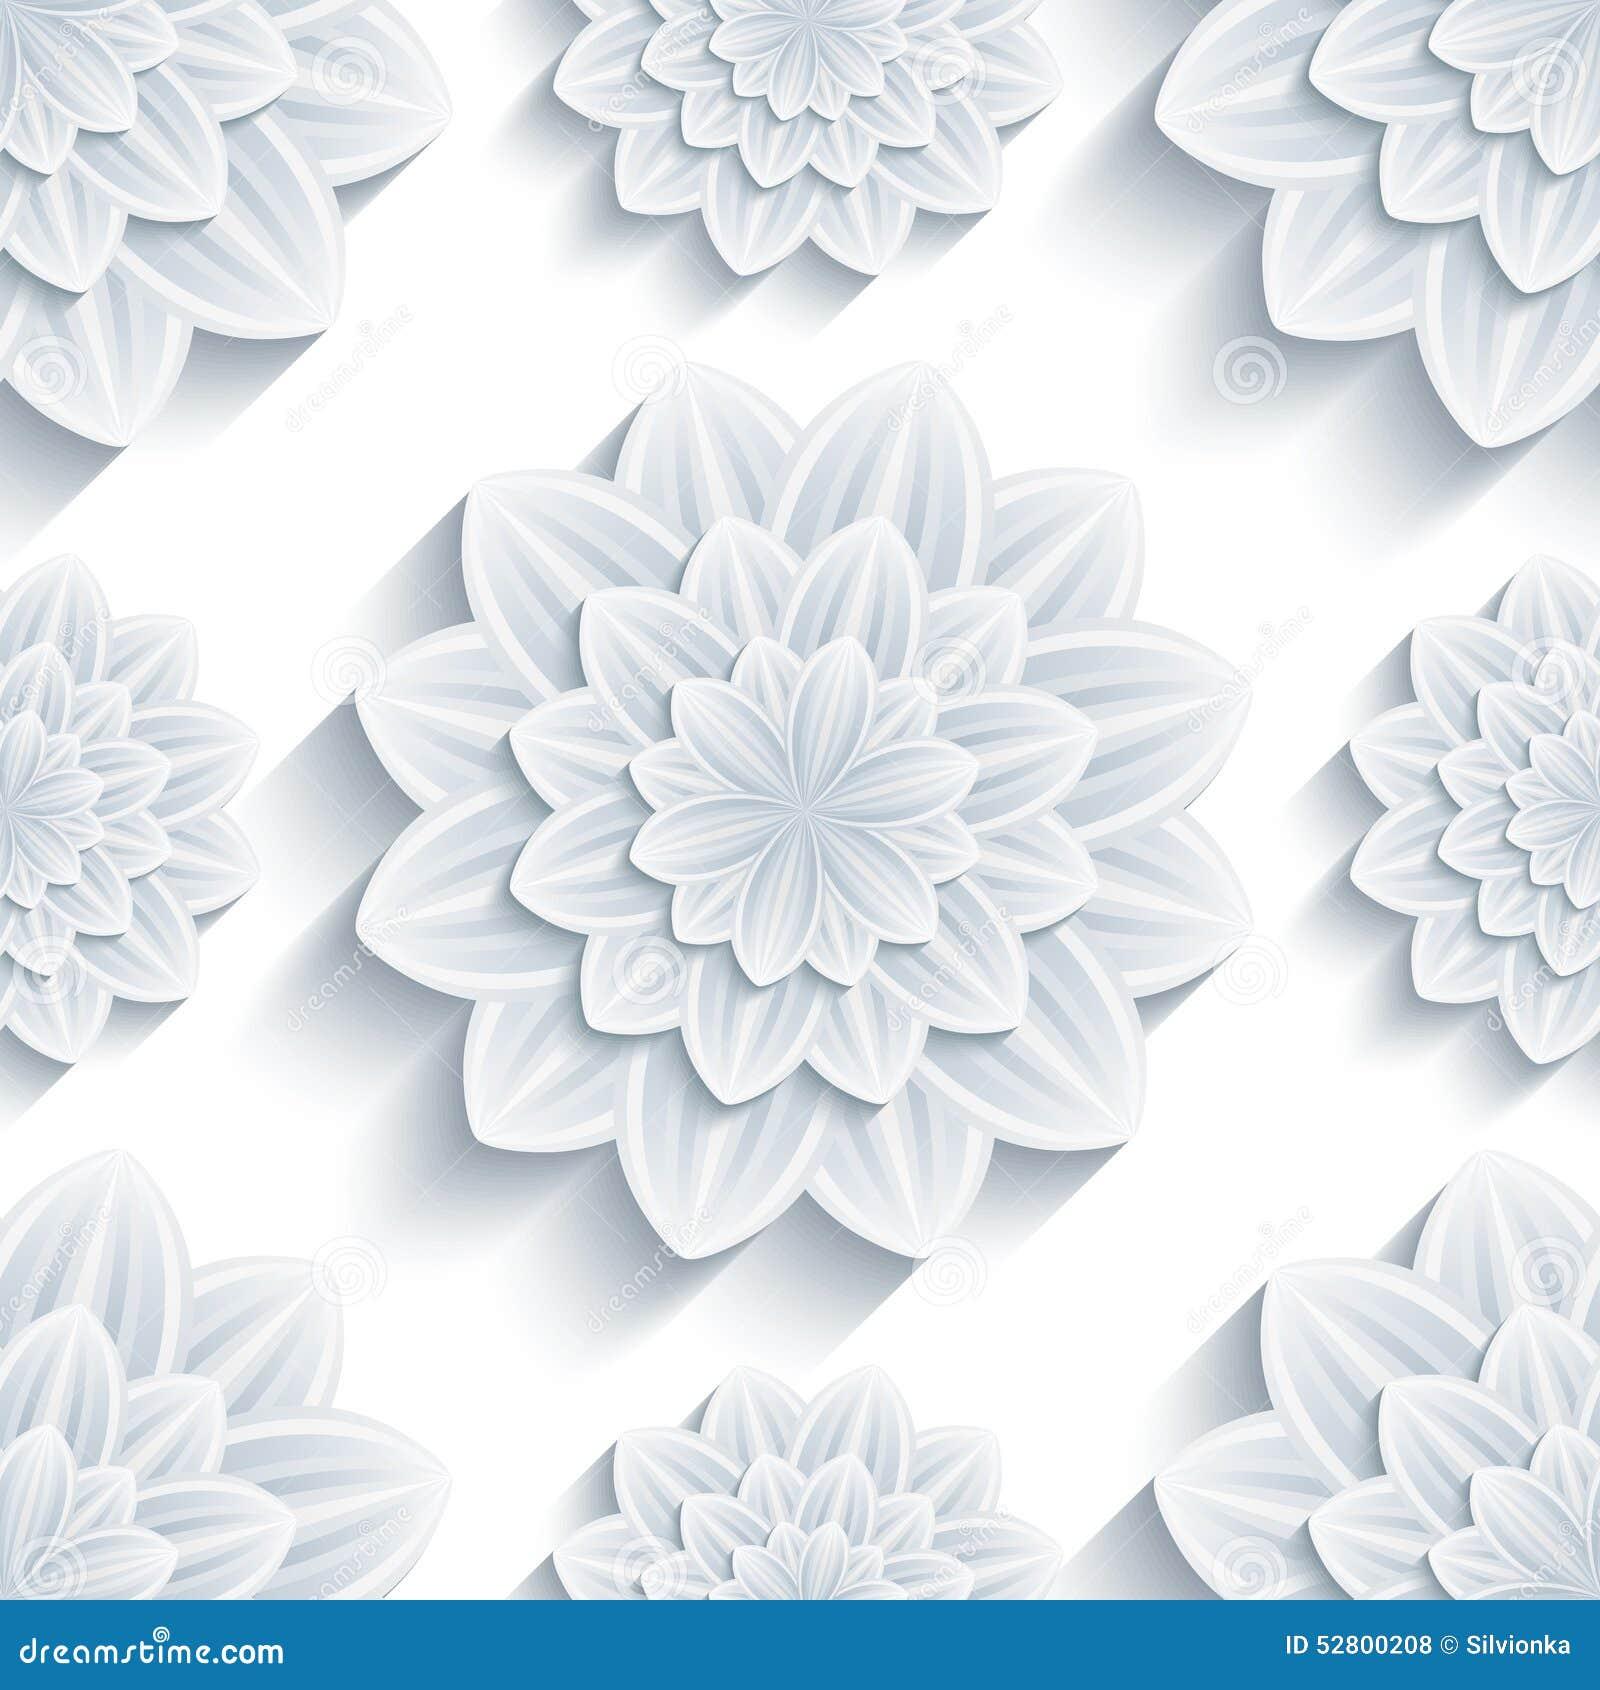 Trendy Wallpaper: Background Seamless Pattern With 3d Flower Chrysanthemum